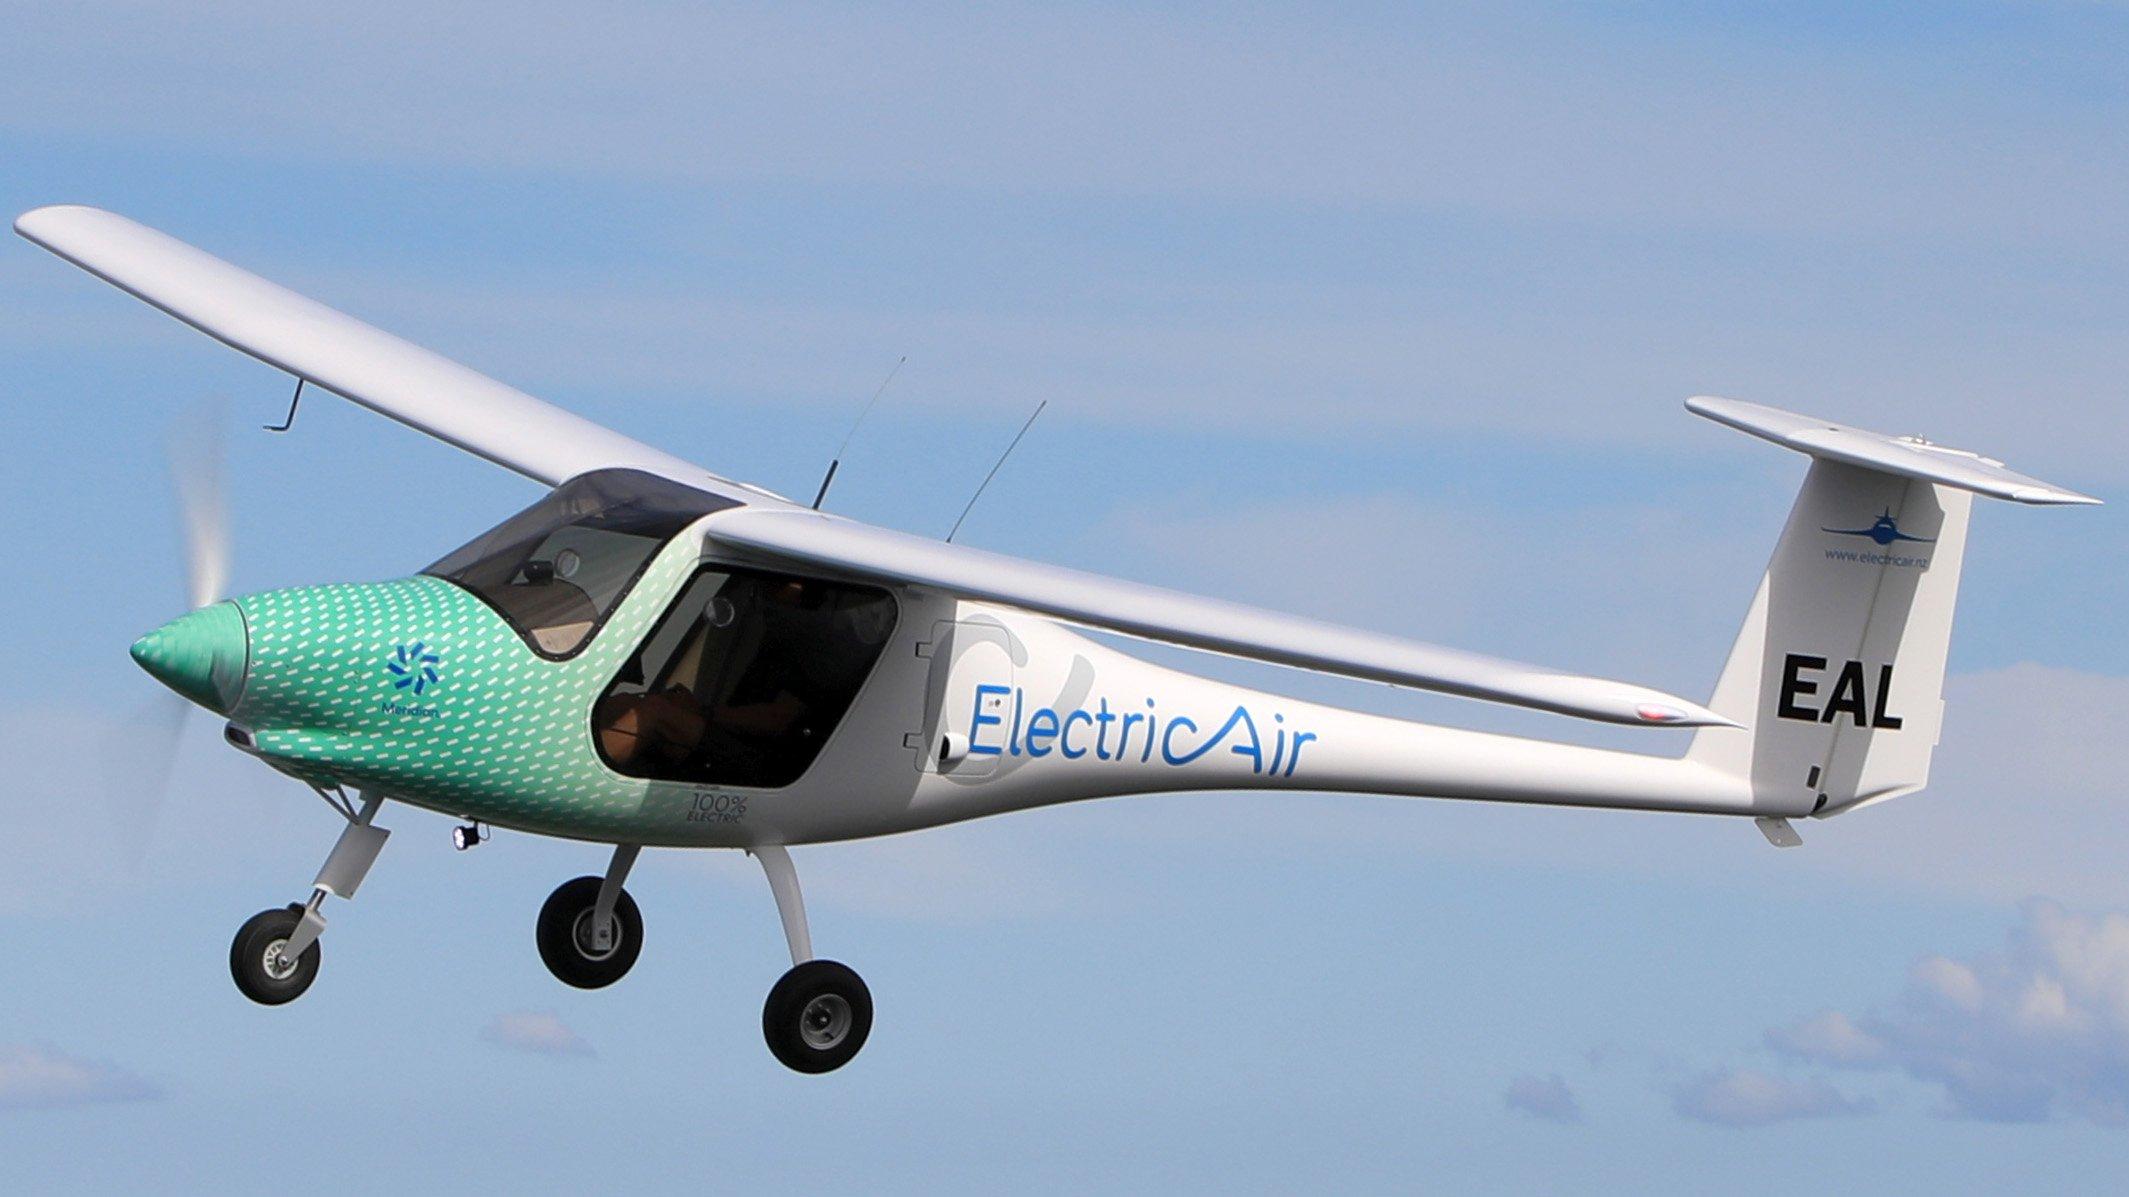 The ElectricAir aircraft. Photo: Newsline